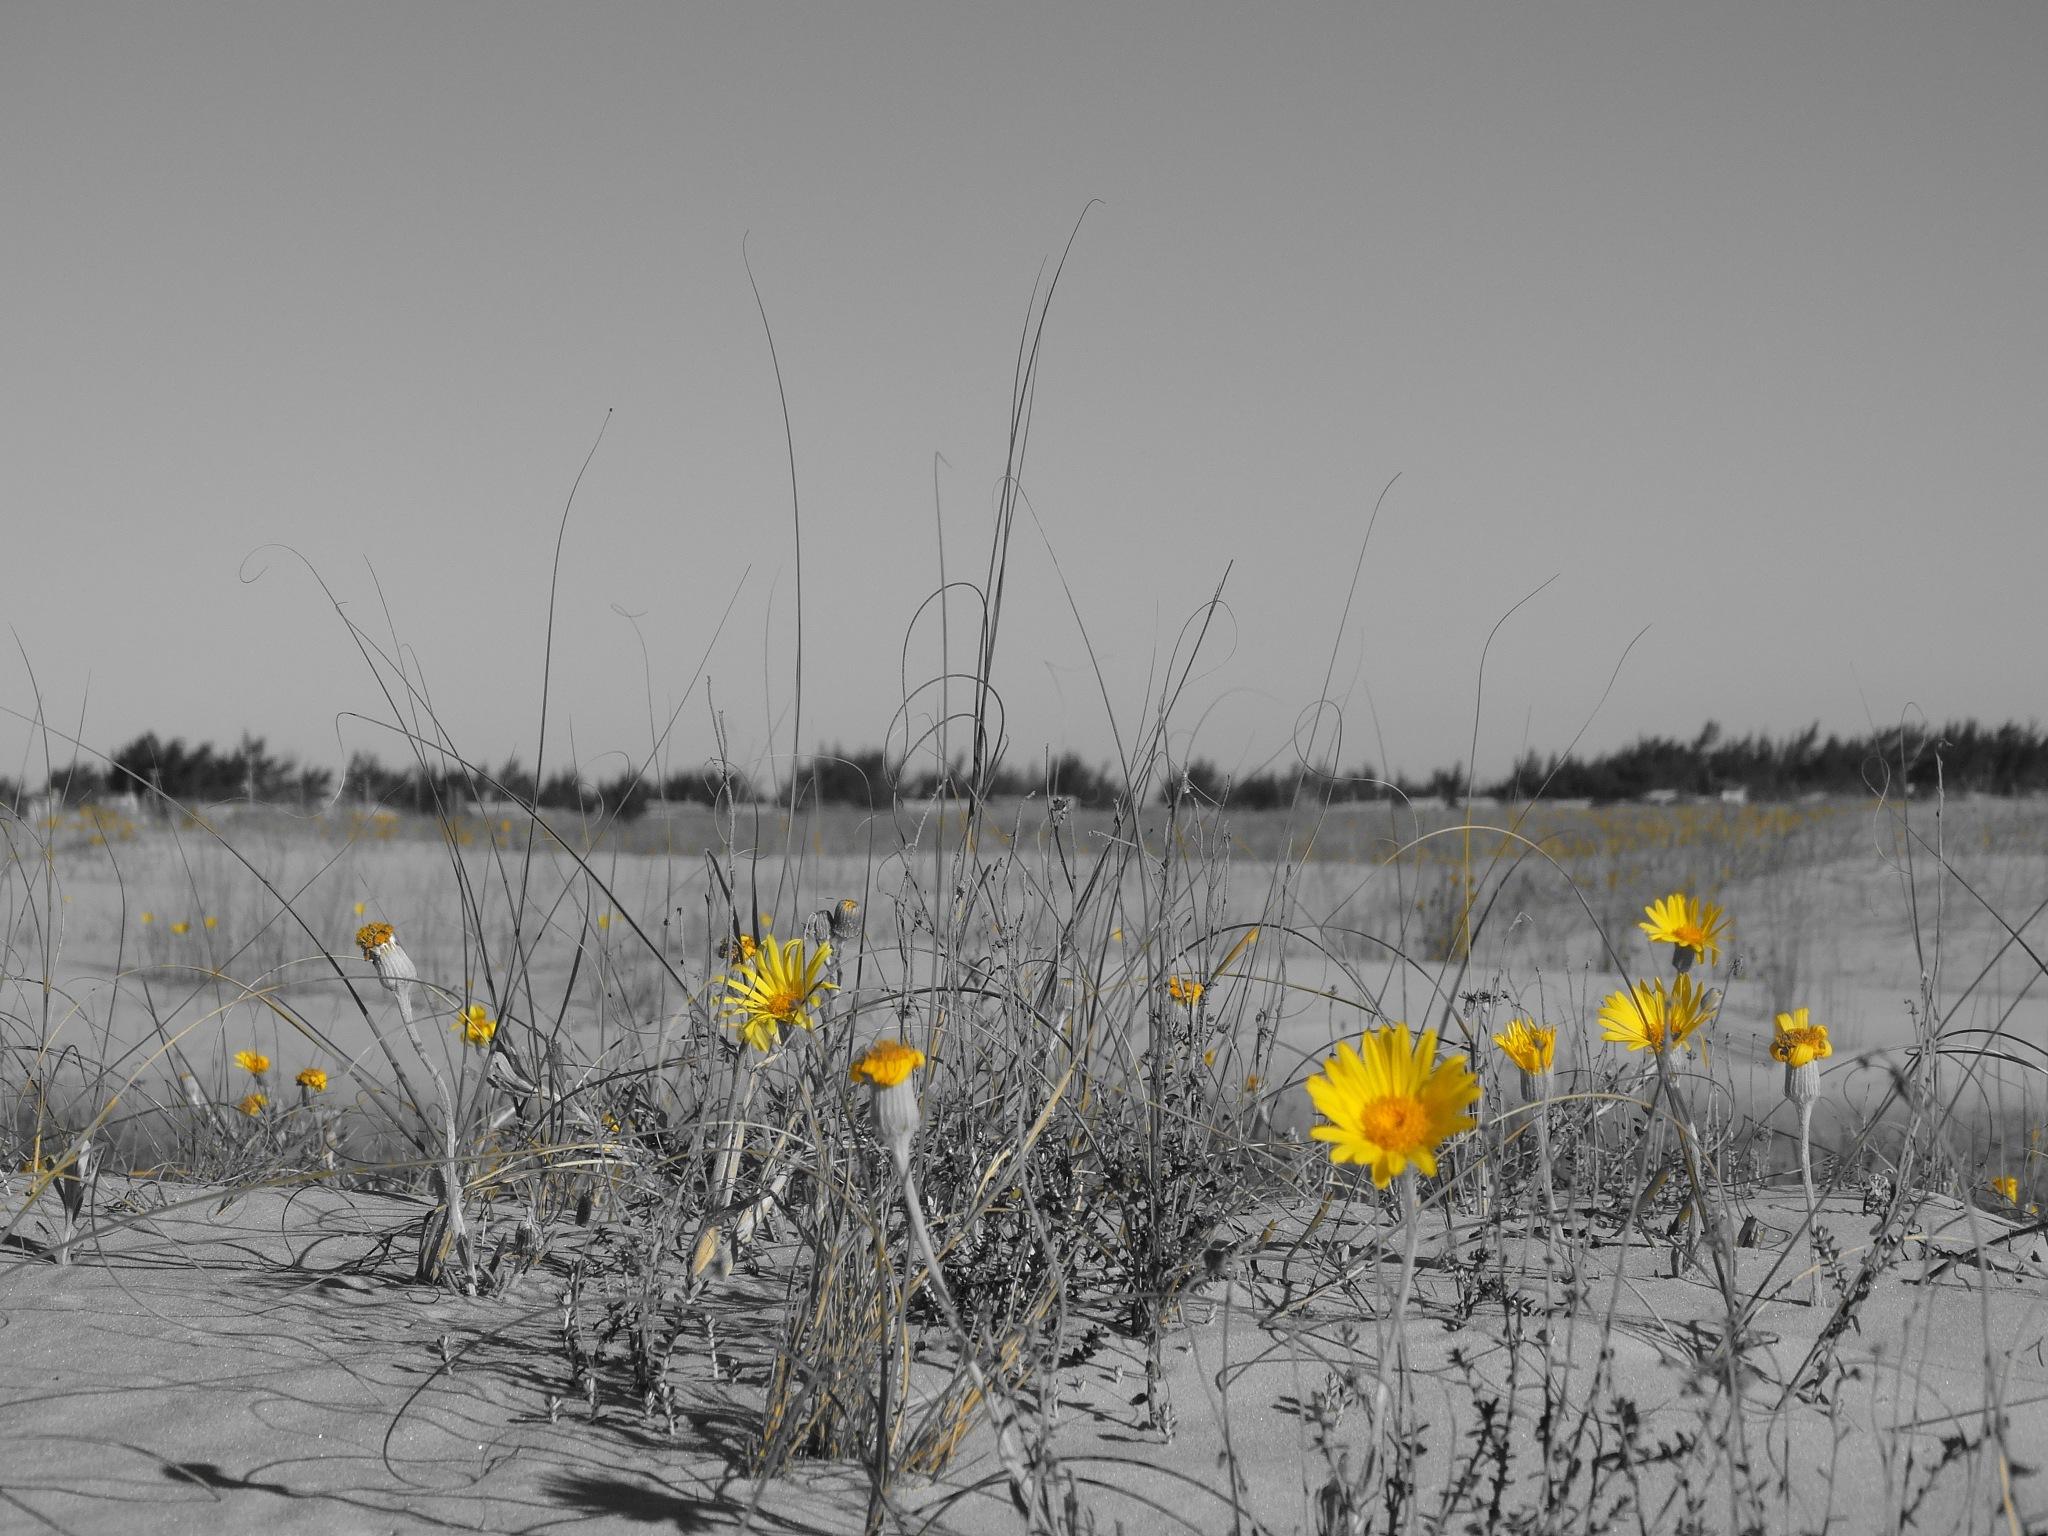 dunas cobertas de amarelo by Maciel Panisson